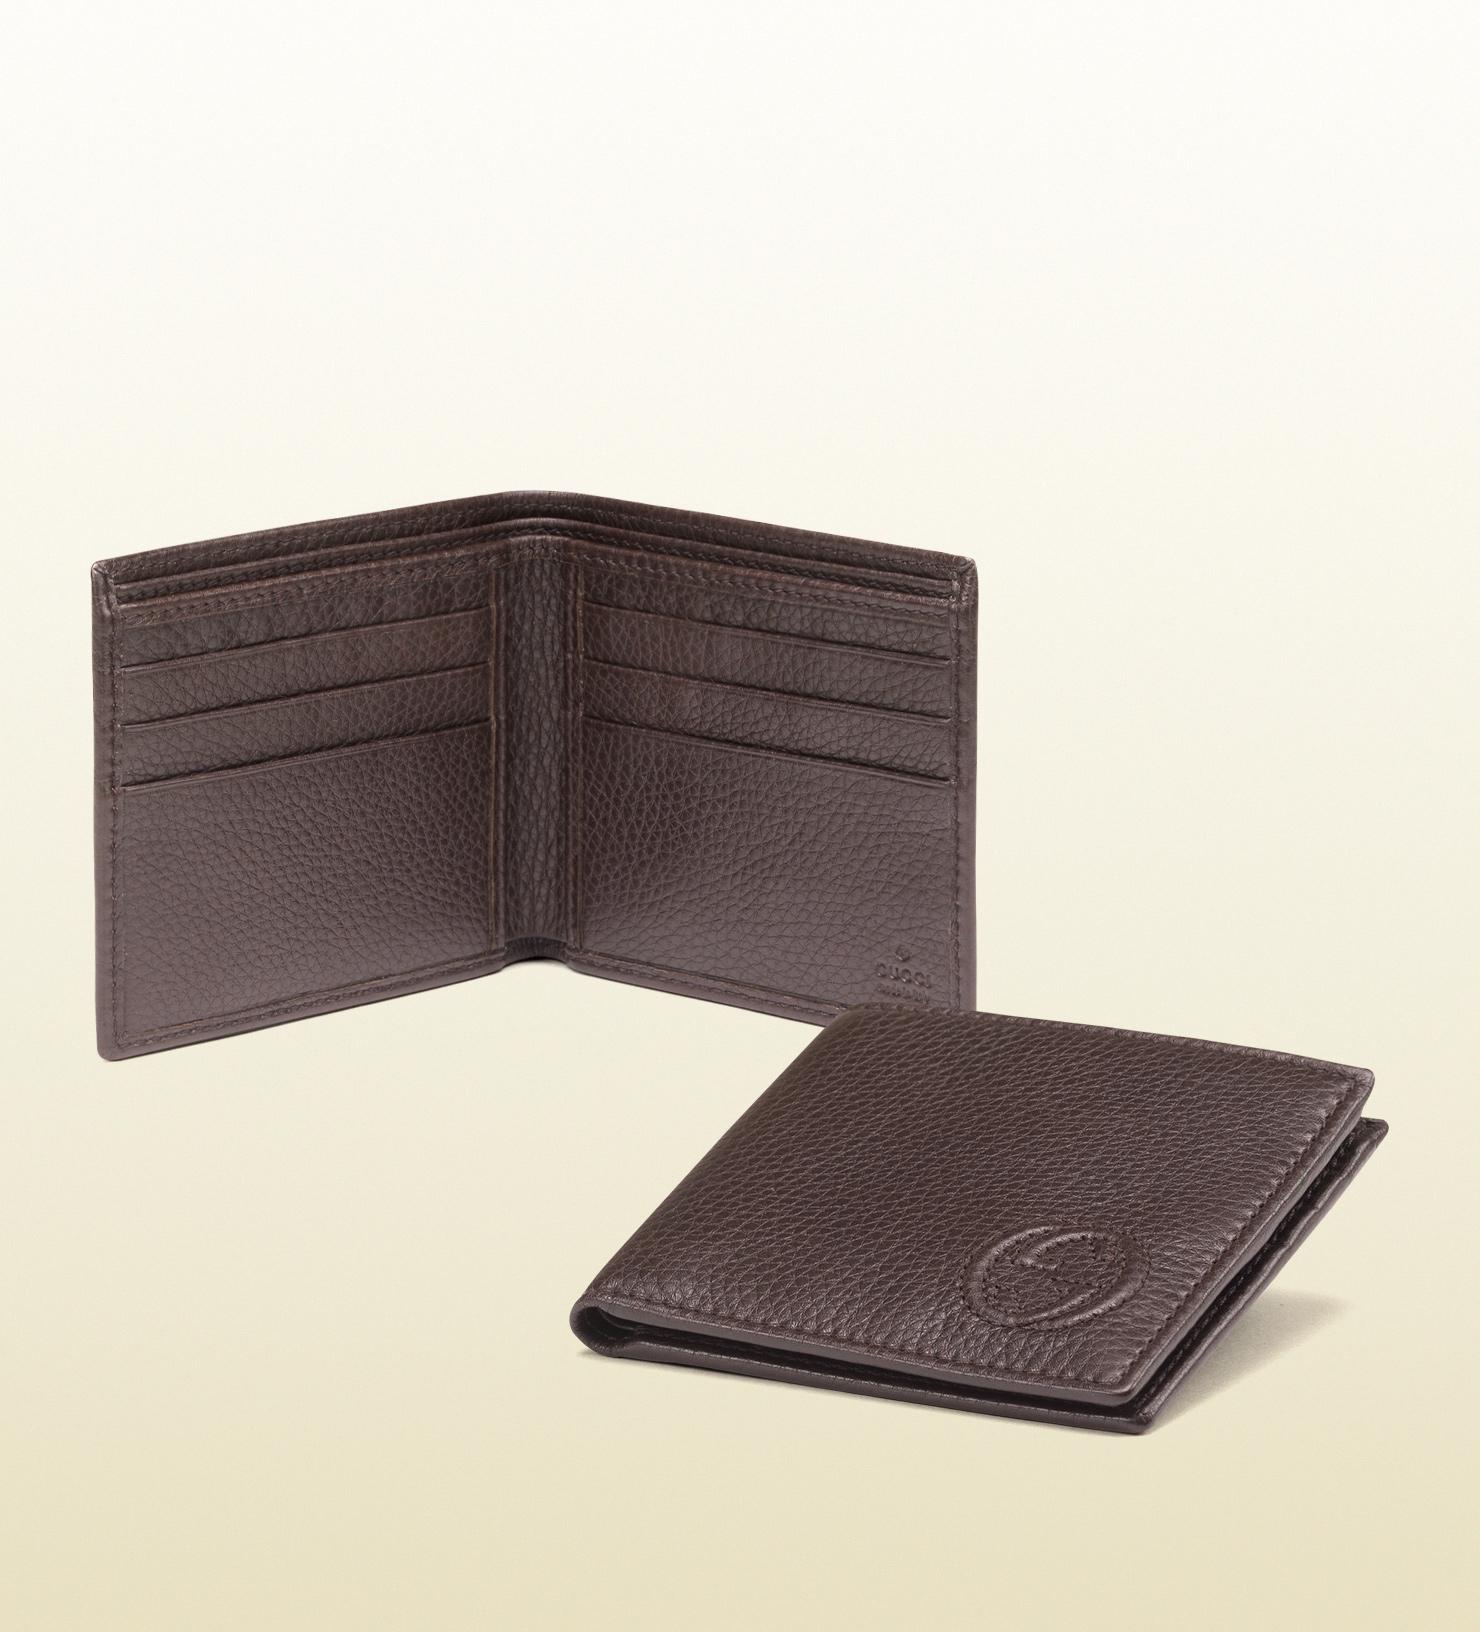 Gucci Soho Leather Bi-fold Wallet in Brown for Men | Lyst